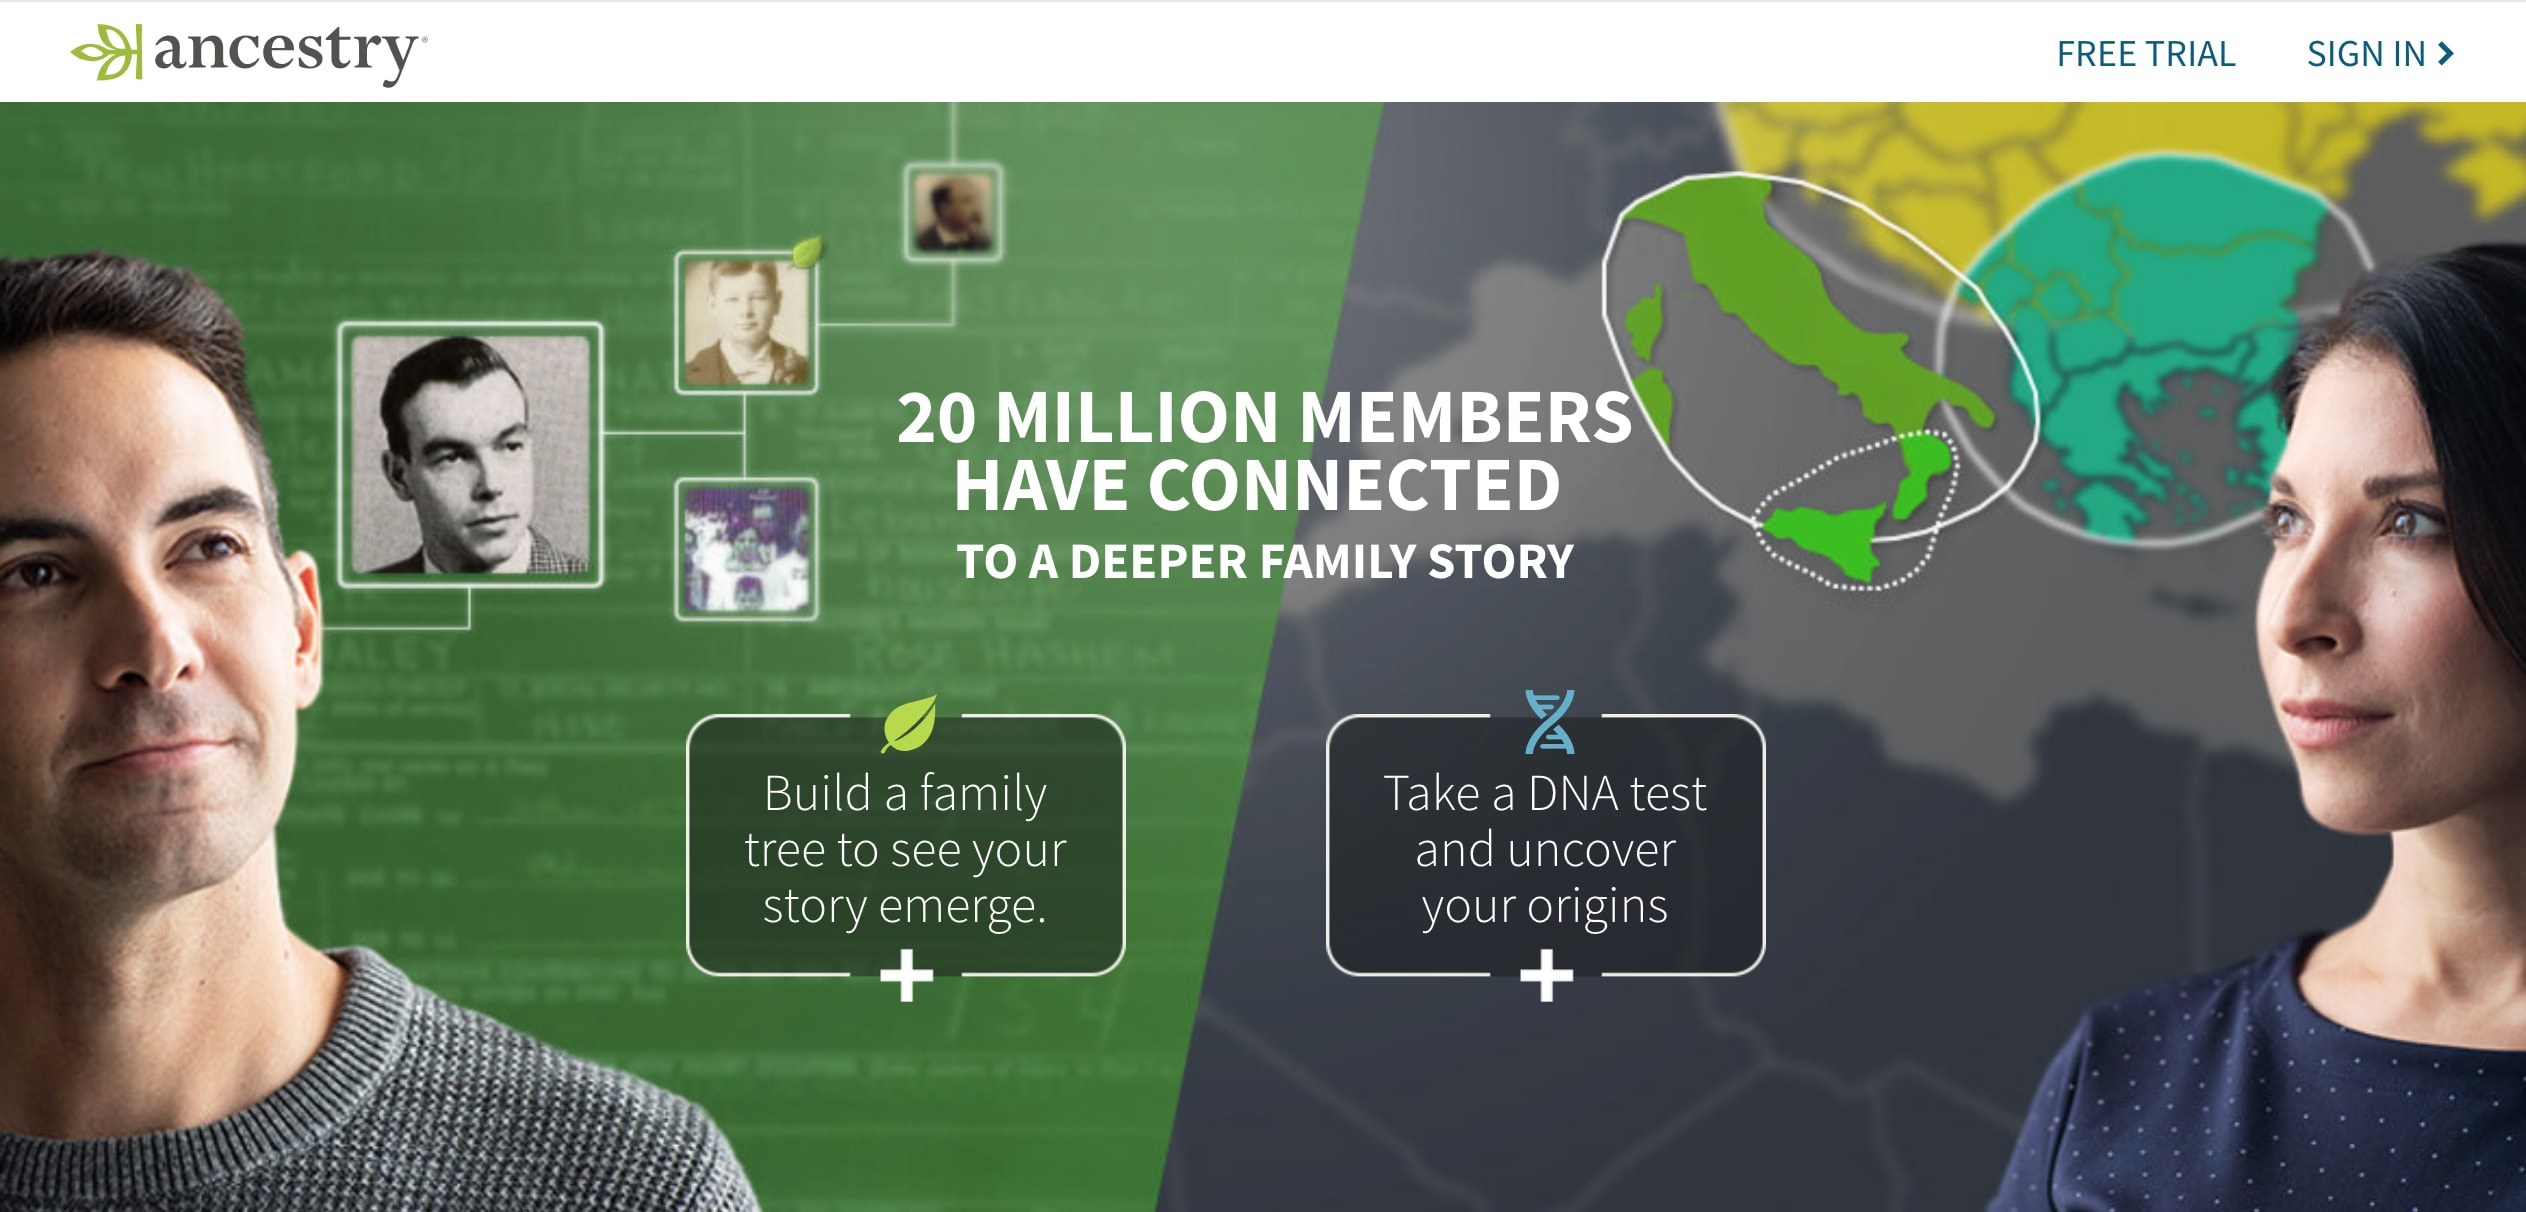 ancestry website